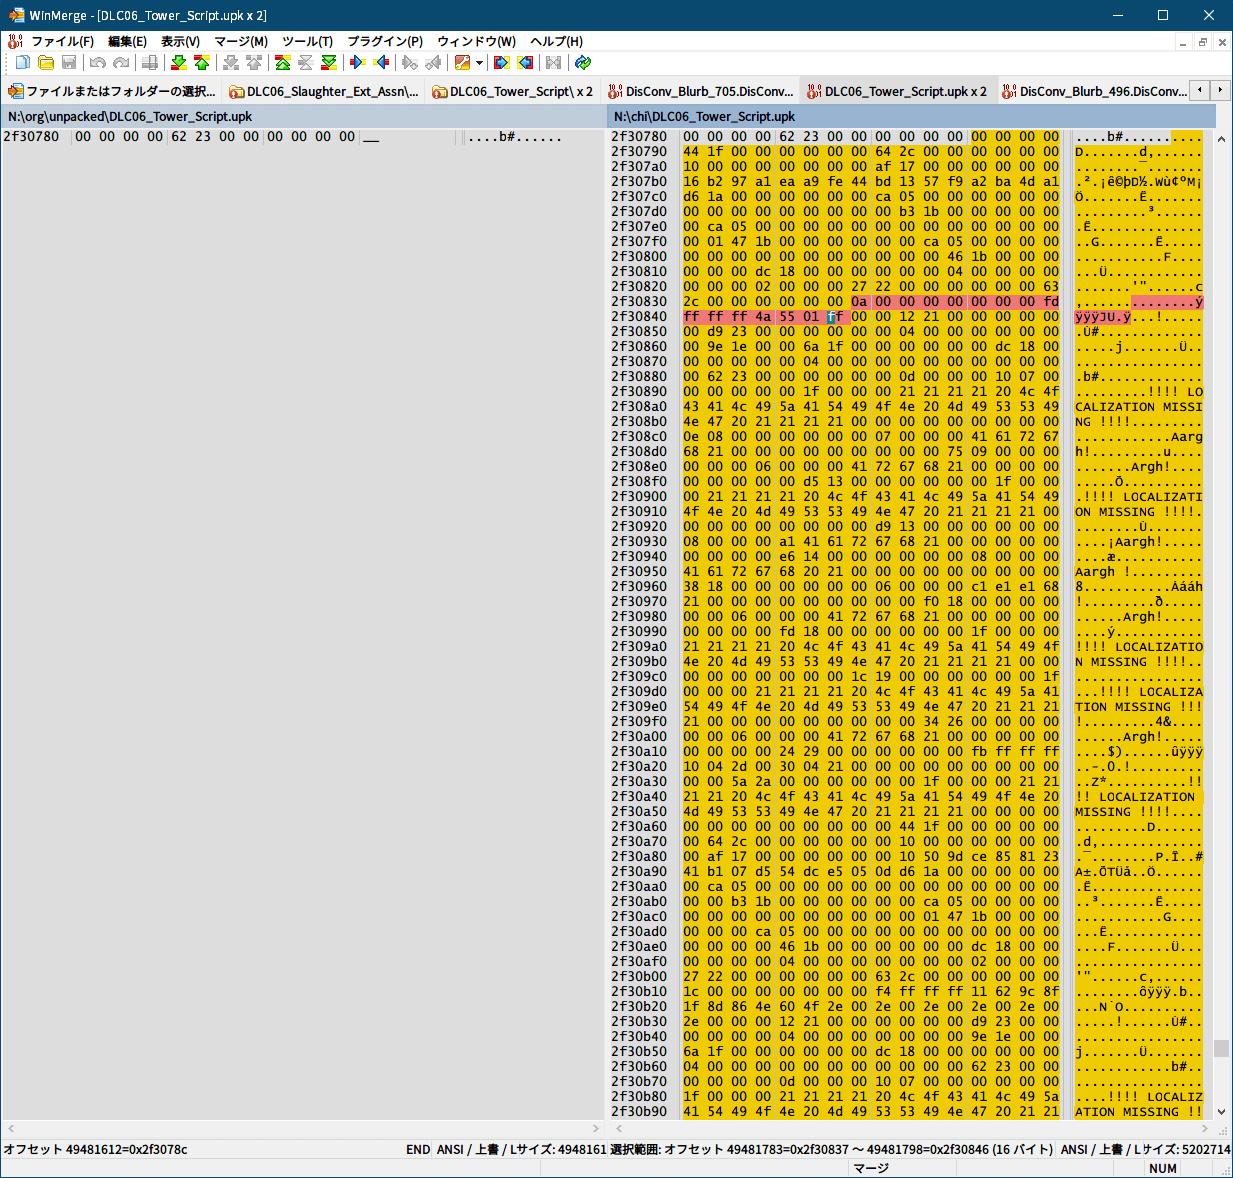 PC ゲーム Dishonored DLC - The Knife of Dunwall(ナイフ・オブ・ダンウォール)の字幕を日本語で表示する方法、PC ゲーム Dishonored - upk 中文化ファイル解析メモ、DLC06_Tower_Script.upk ファイル WinMerge 比較結果、英語版 DLC06_Tower_Script.upk ファイルバイナリデータ終端アドレス以降、中文化 DLC06_Tower_Script.upk ファイルでは DisConv_Blurb_496.DisConv_Blurb ファイルのバイナリデータ丸ごと追加された状態